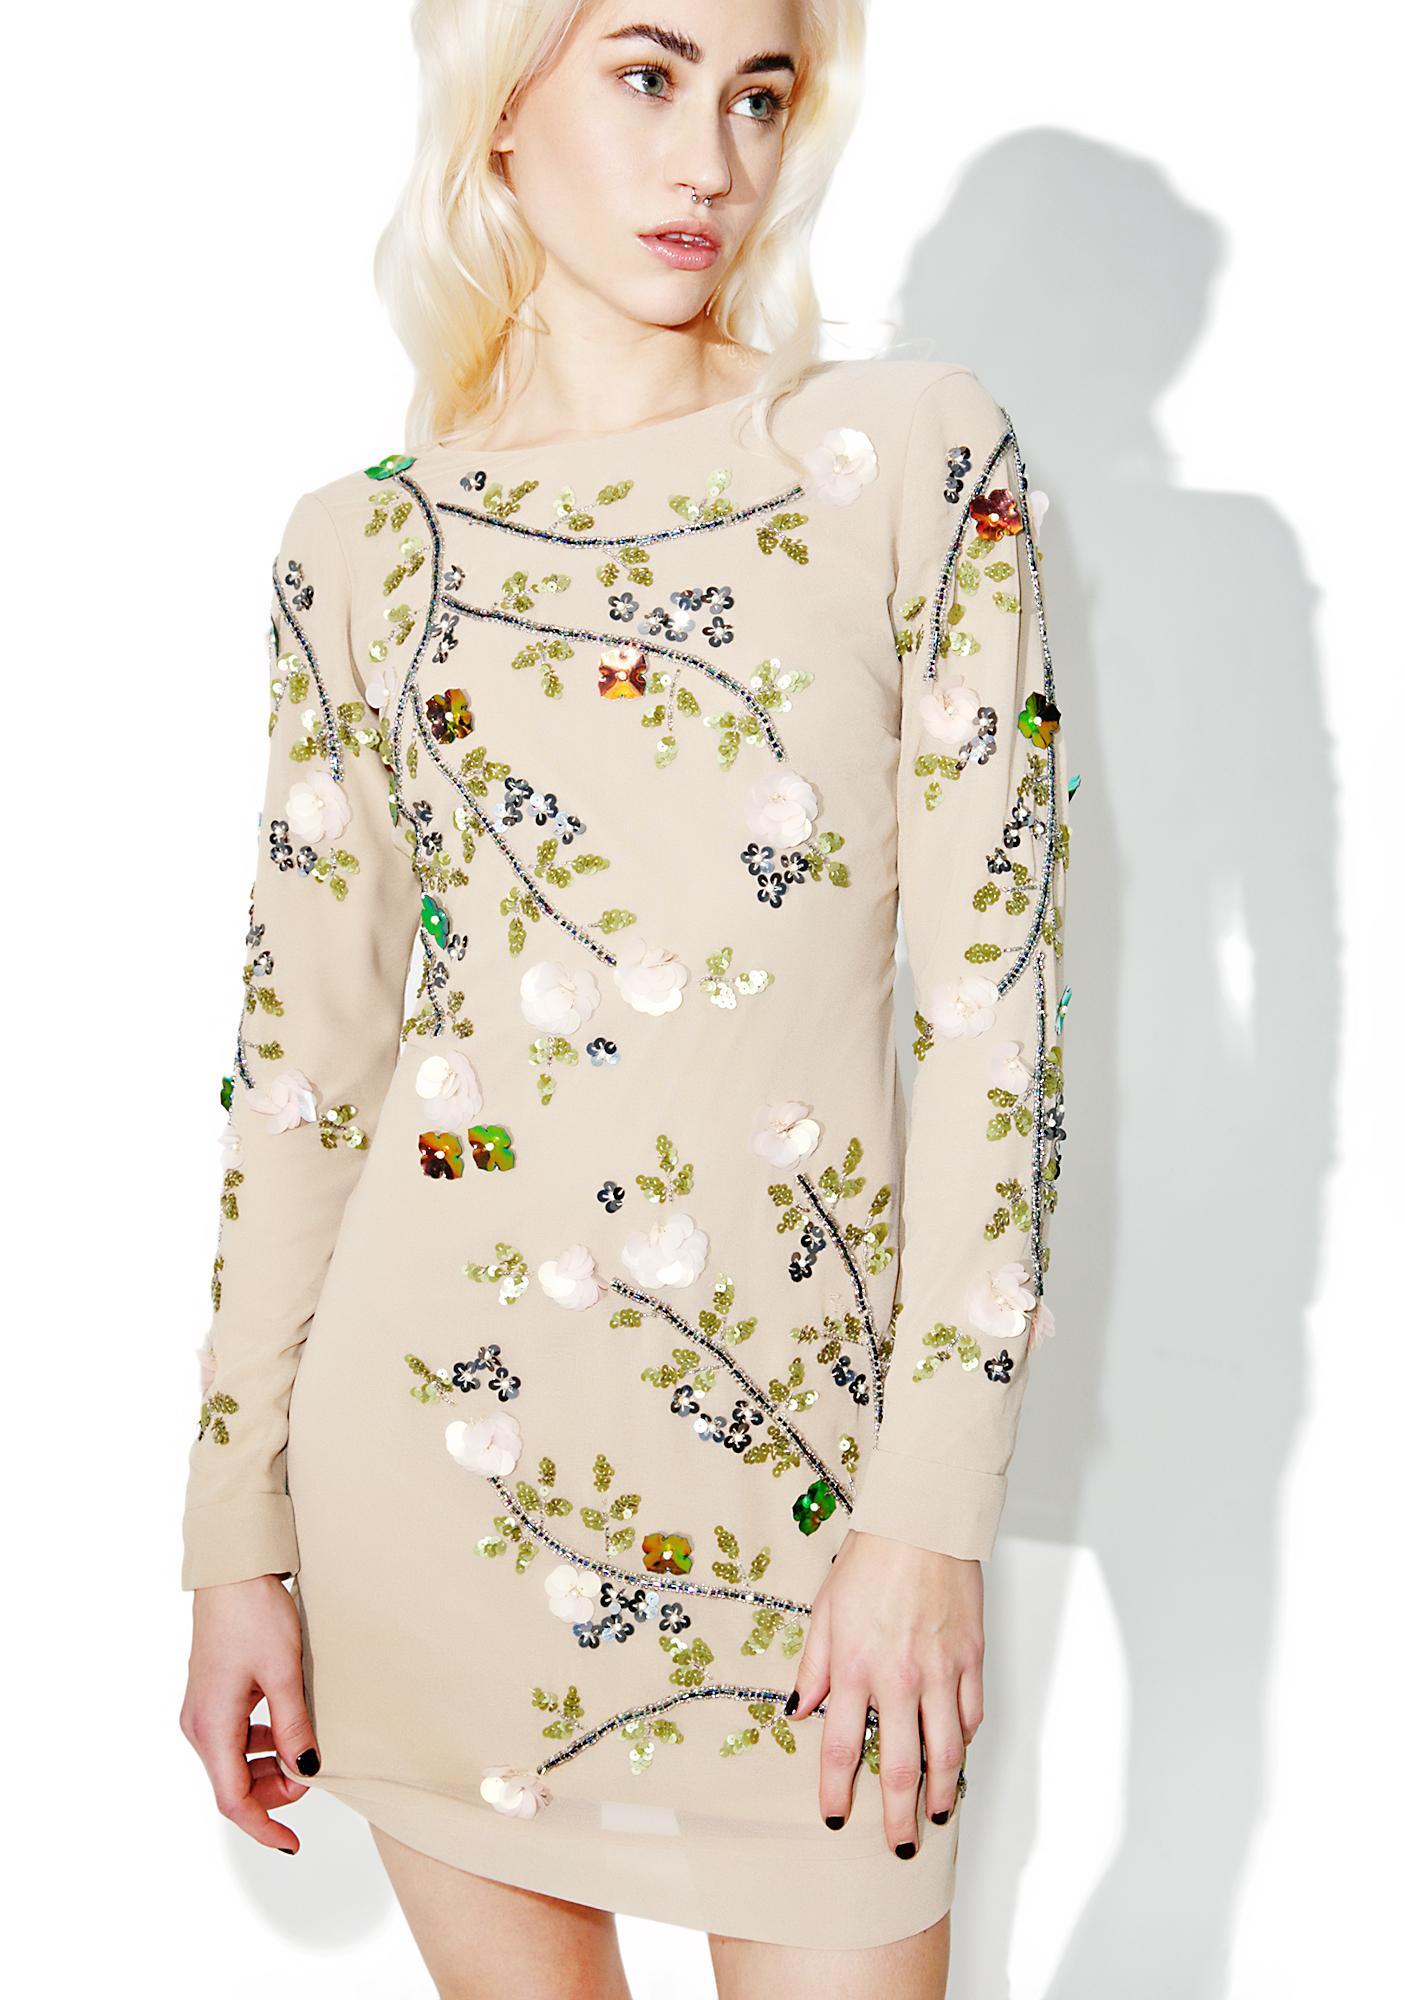 Glamorous Cherry Blossom Bodycon Dress